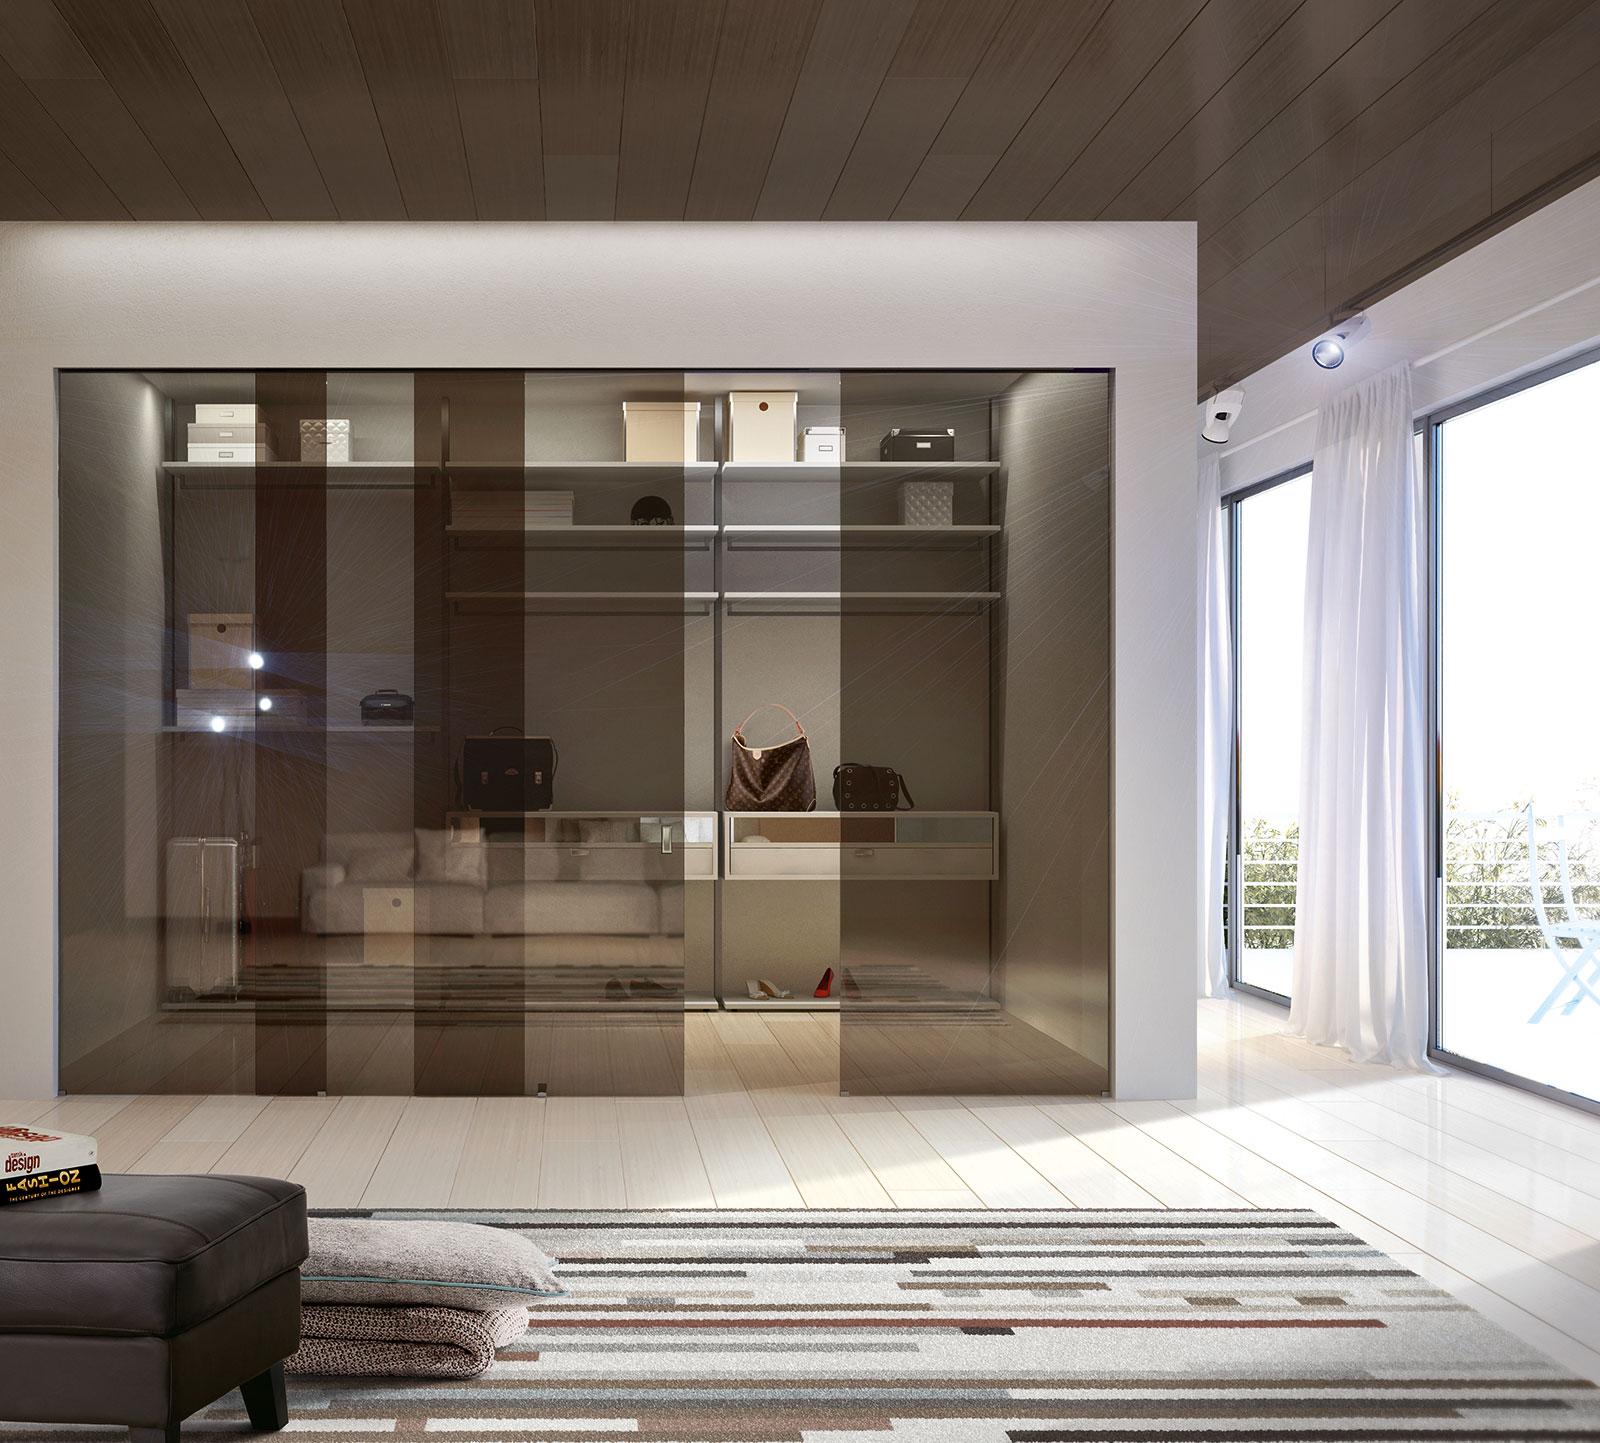 Cabina armadio su misura porte sistemi henry glass for Cabina armadio